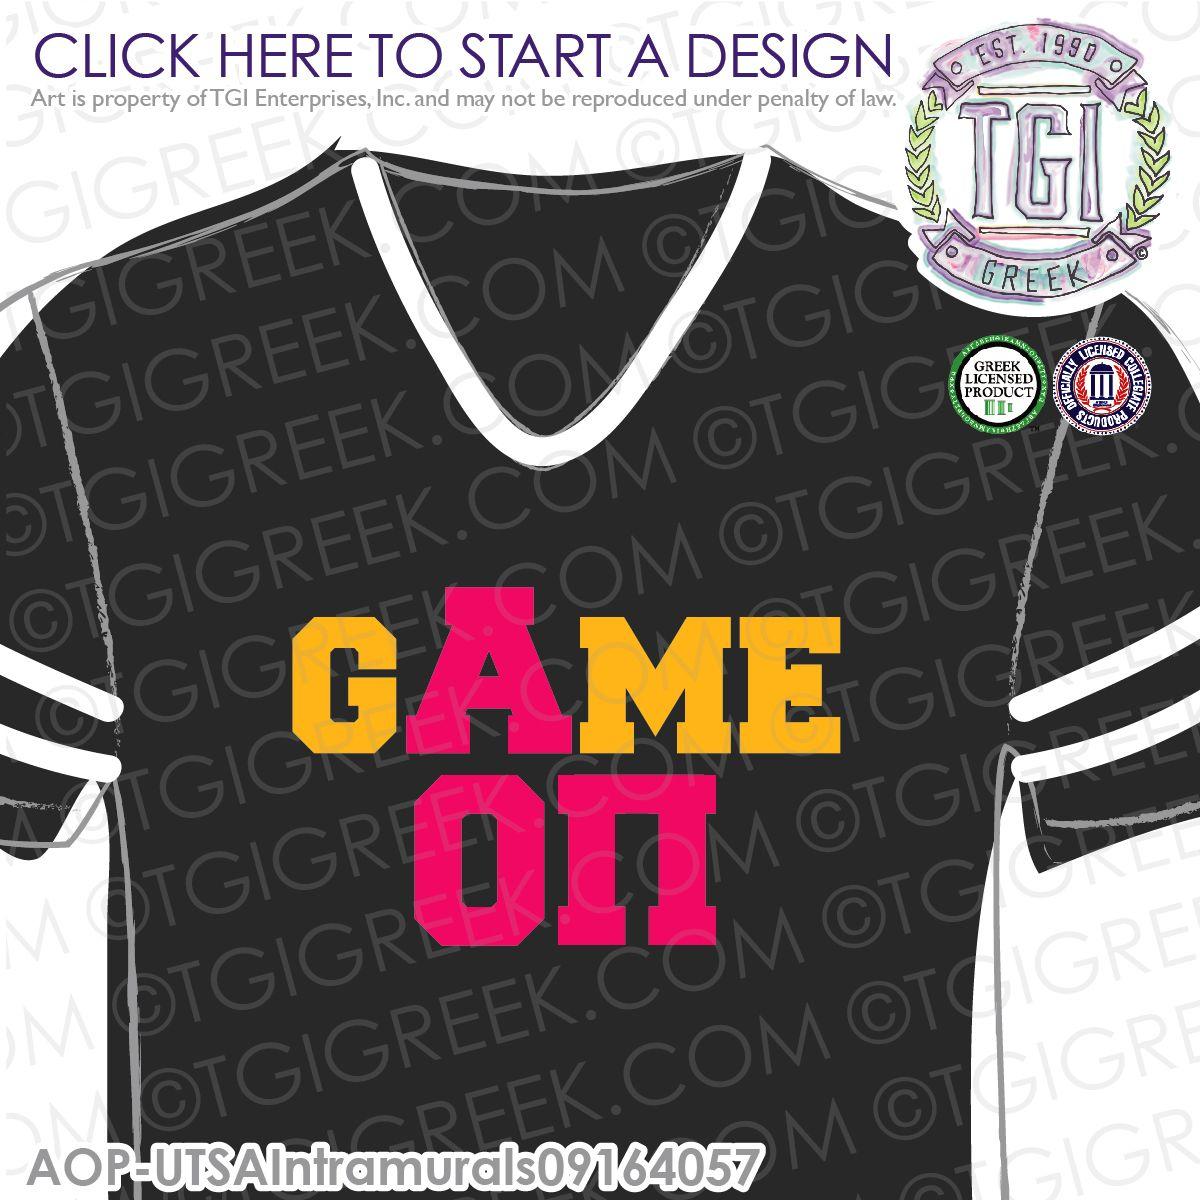 Alpha Omicron Pi | AOII | Intramural | Athletics | Sisterhood | Intramural Tee | Intramural Jersey | TGI Greek | Greek Apparel | Custom Apparel | Sorority Tee Shirts| Sorority Tanks | Sorority T-shirts